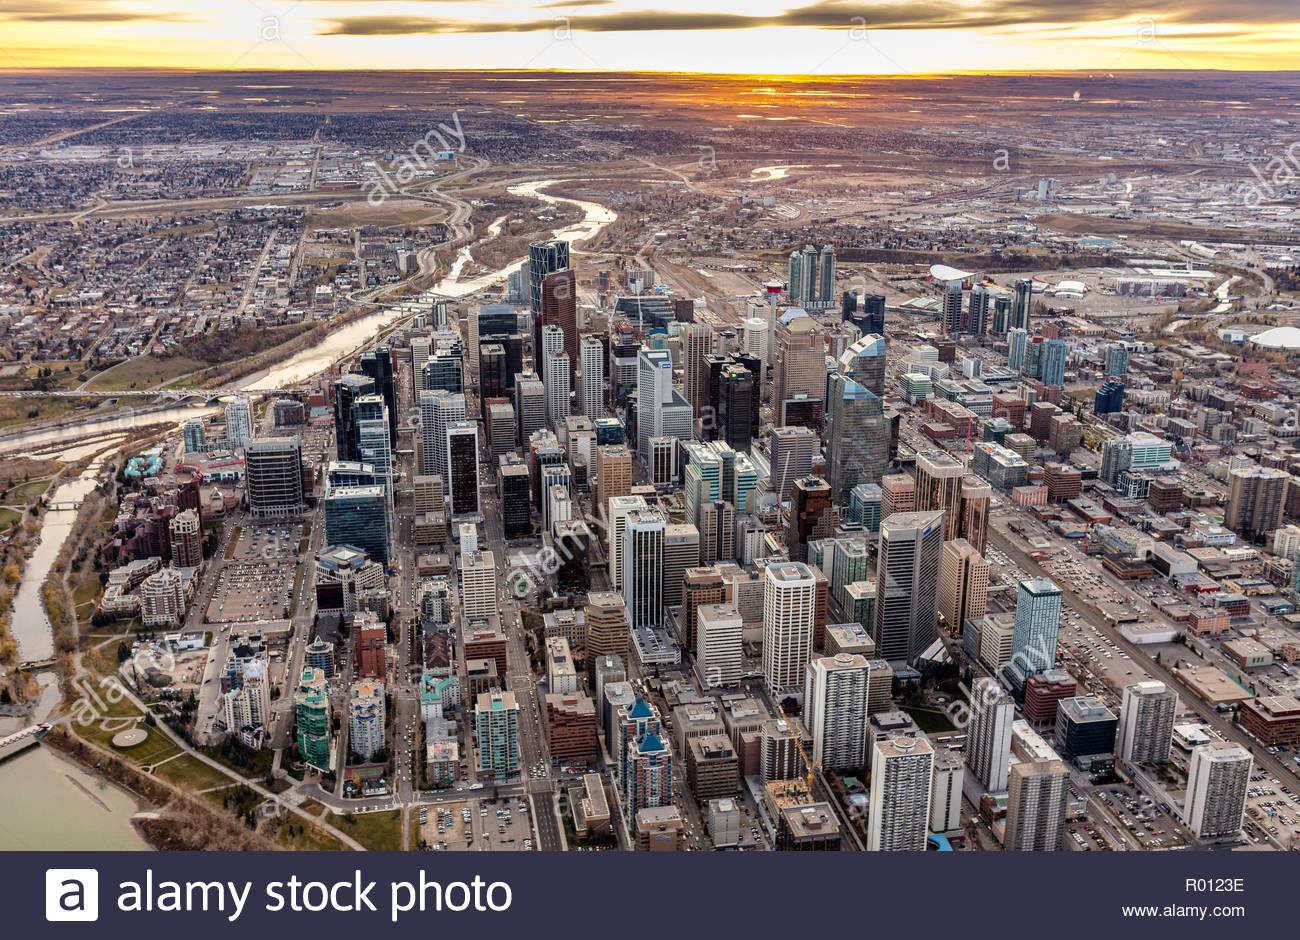 Sonnenaufgang über der Stadt Calgary, Alberta, Kanada Stockbild